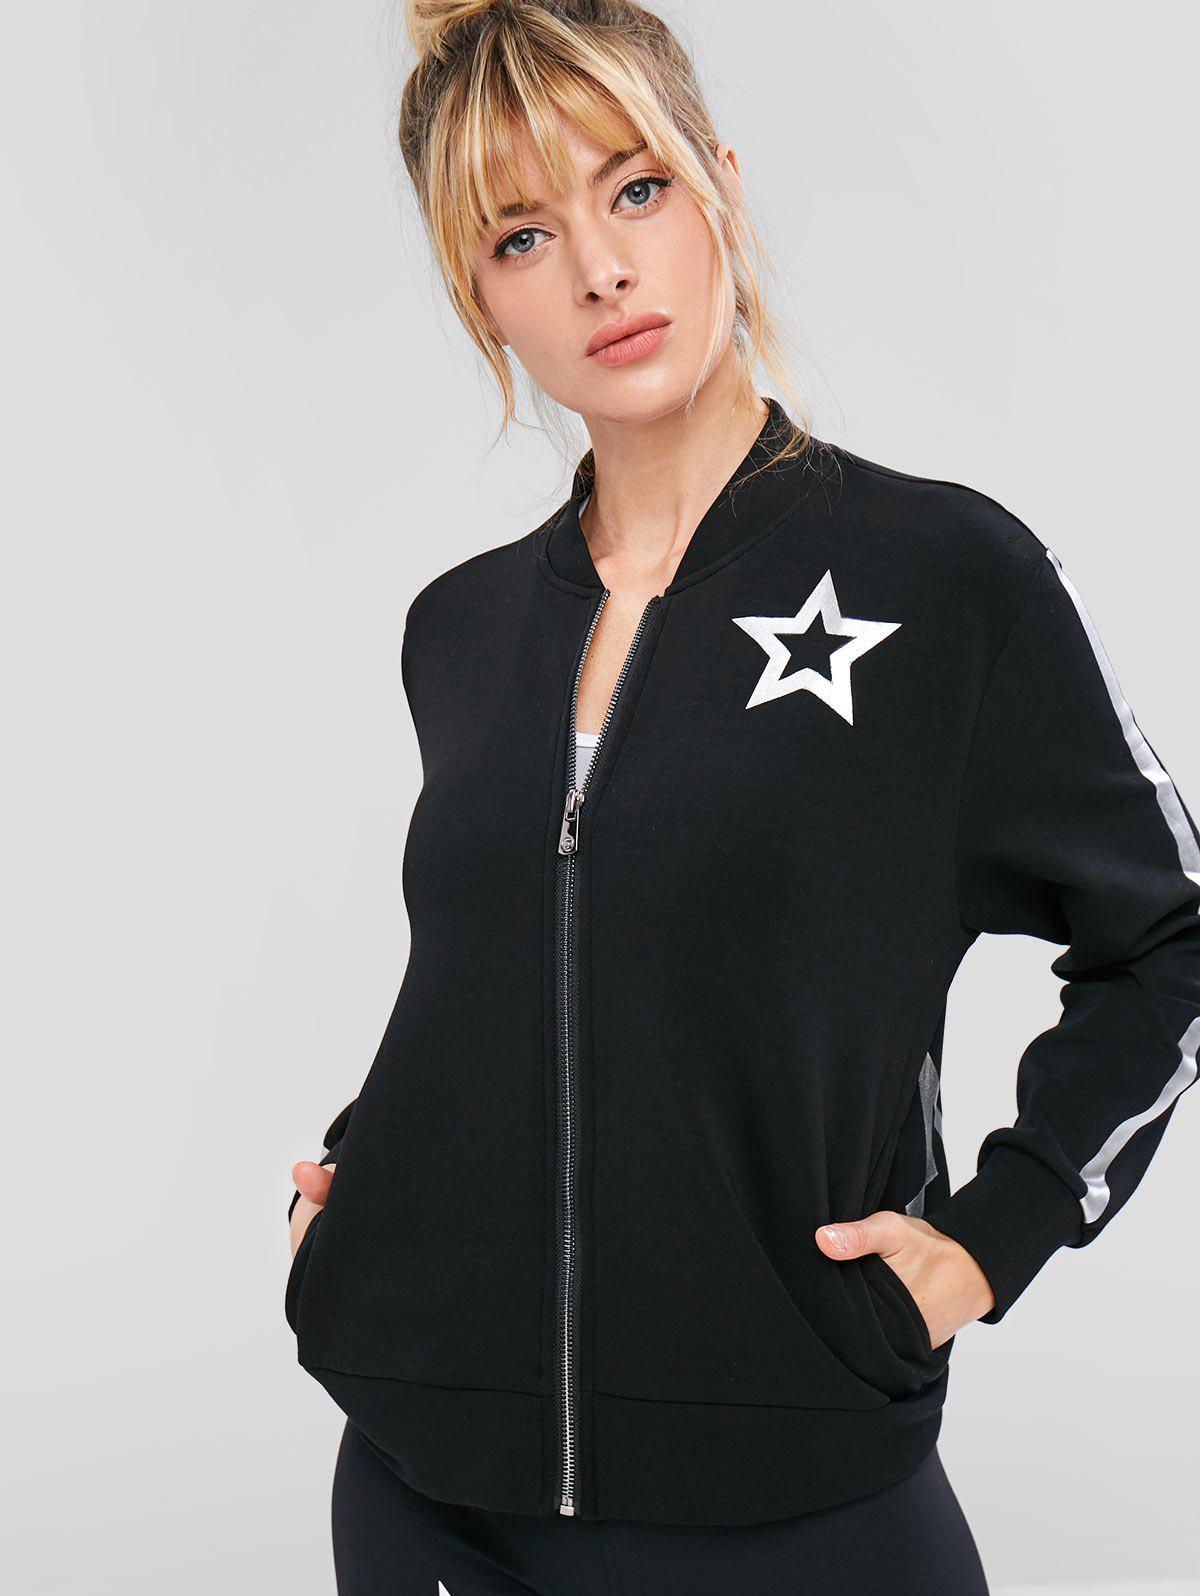 ZAFUL Star Print Zipper Jacket